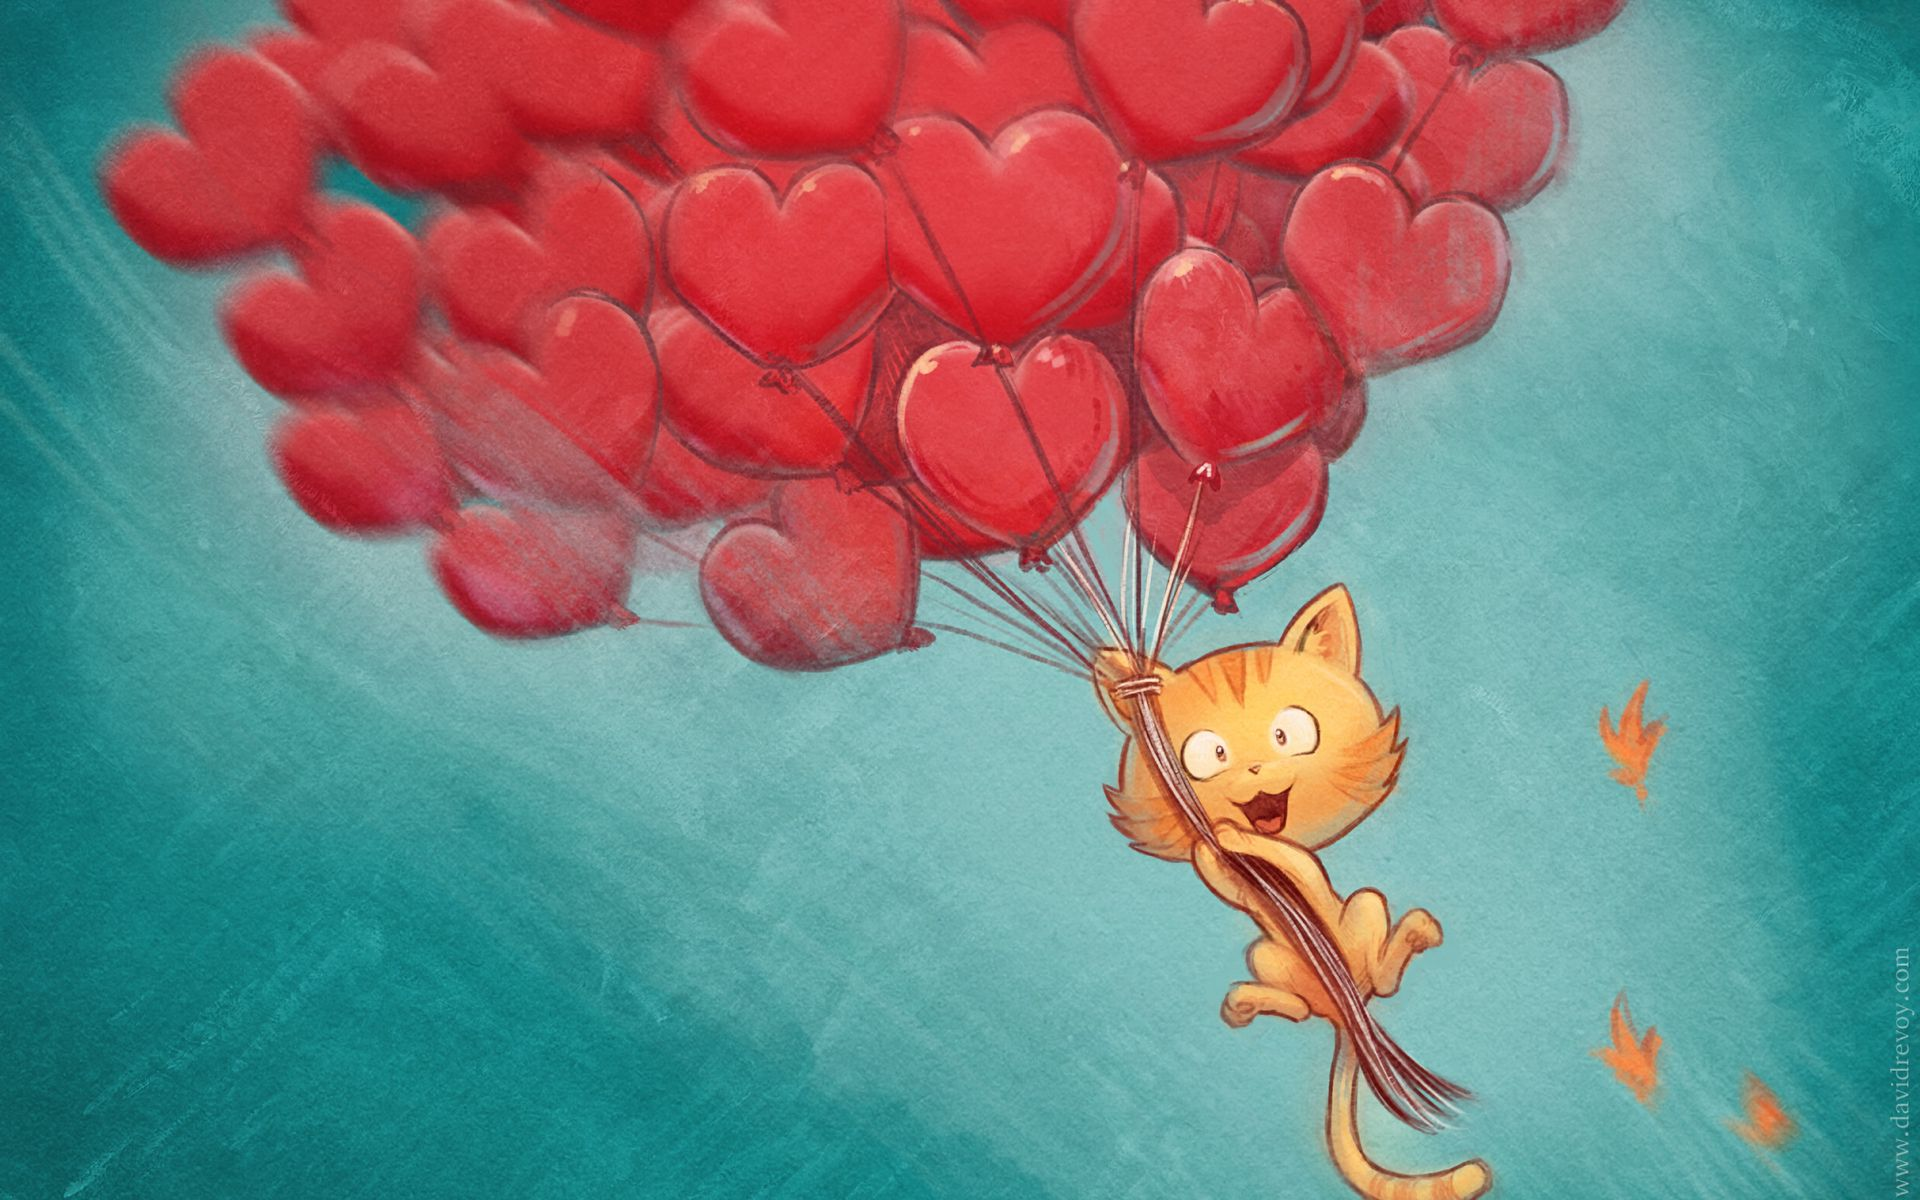 1920x1200 Wallpaper cat, balloons, hearts, flight, sky, art